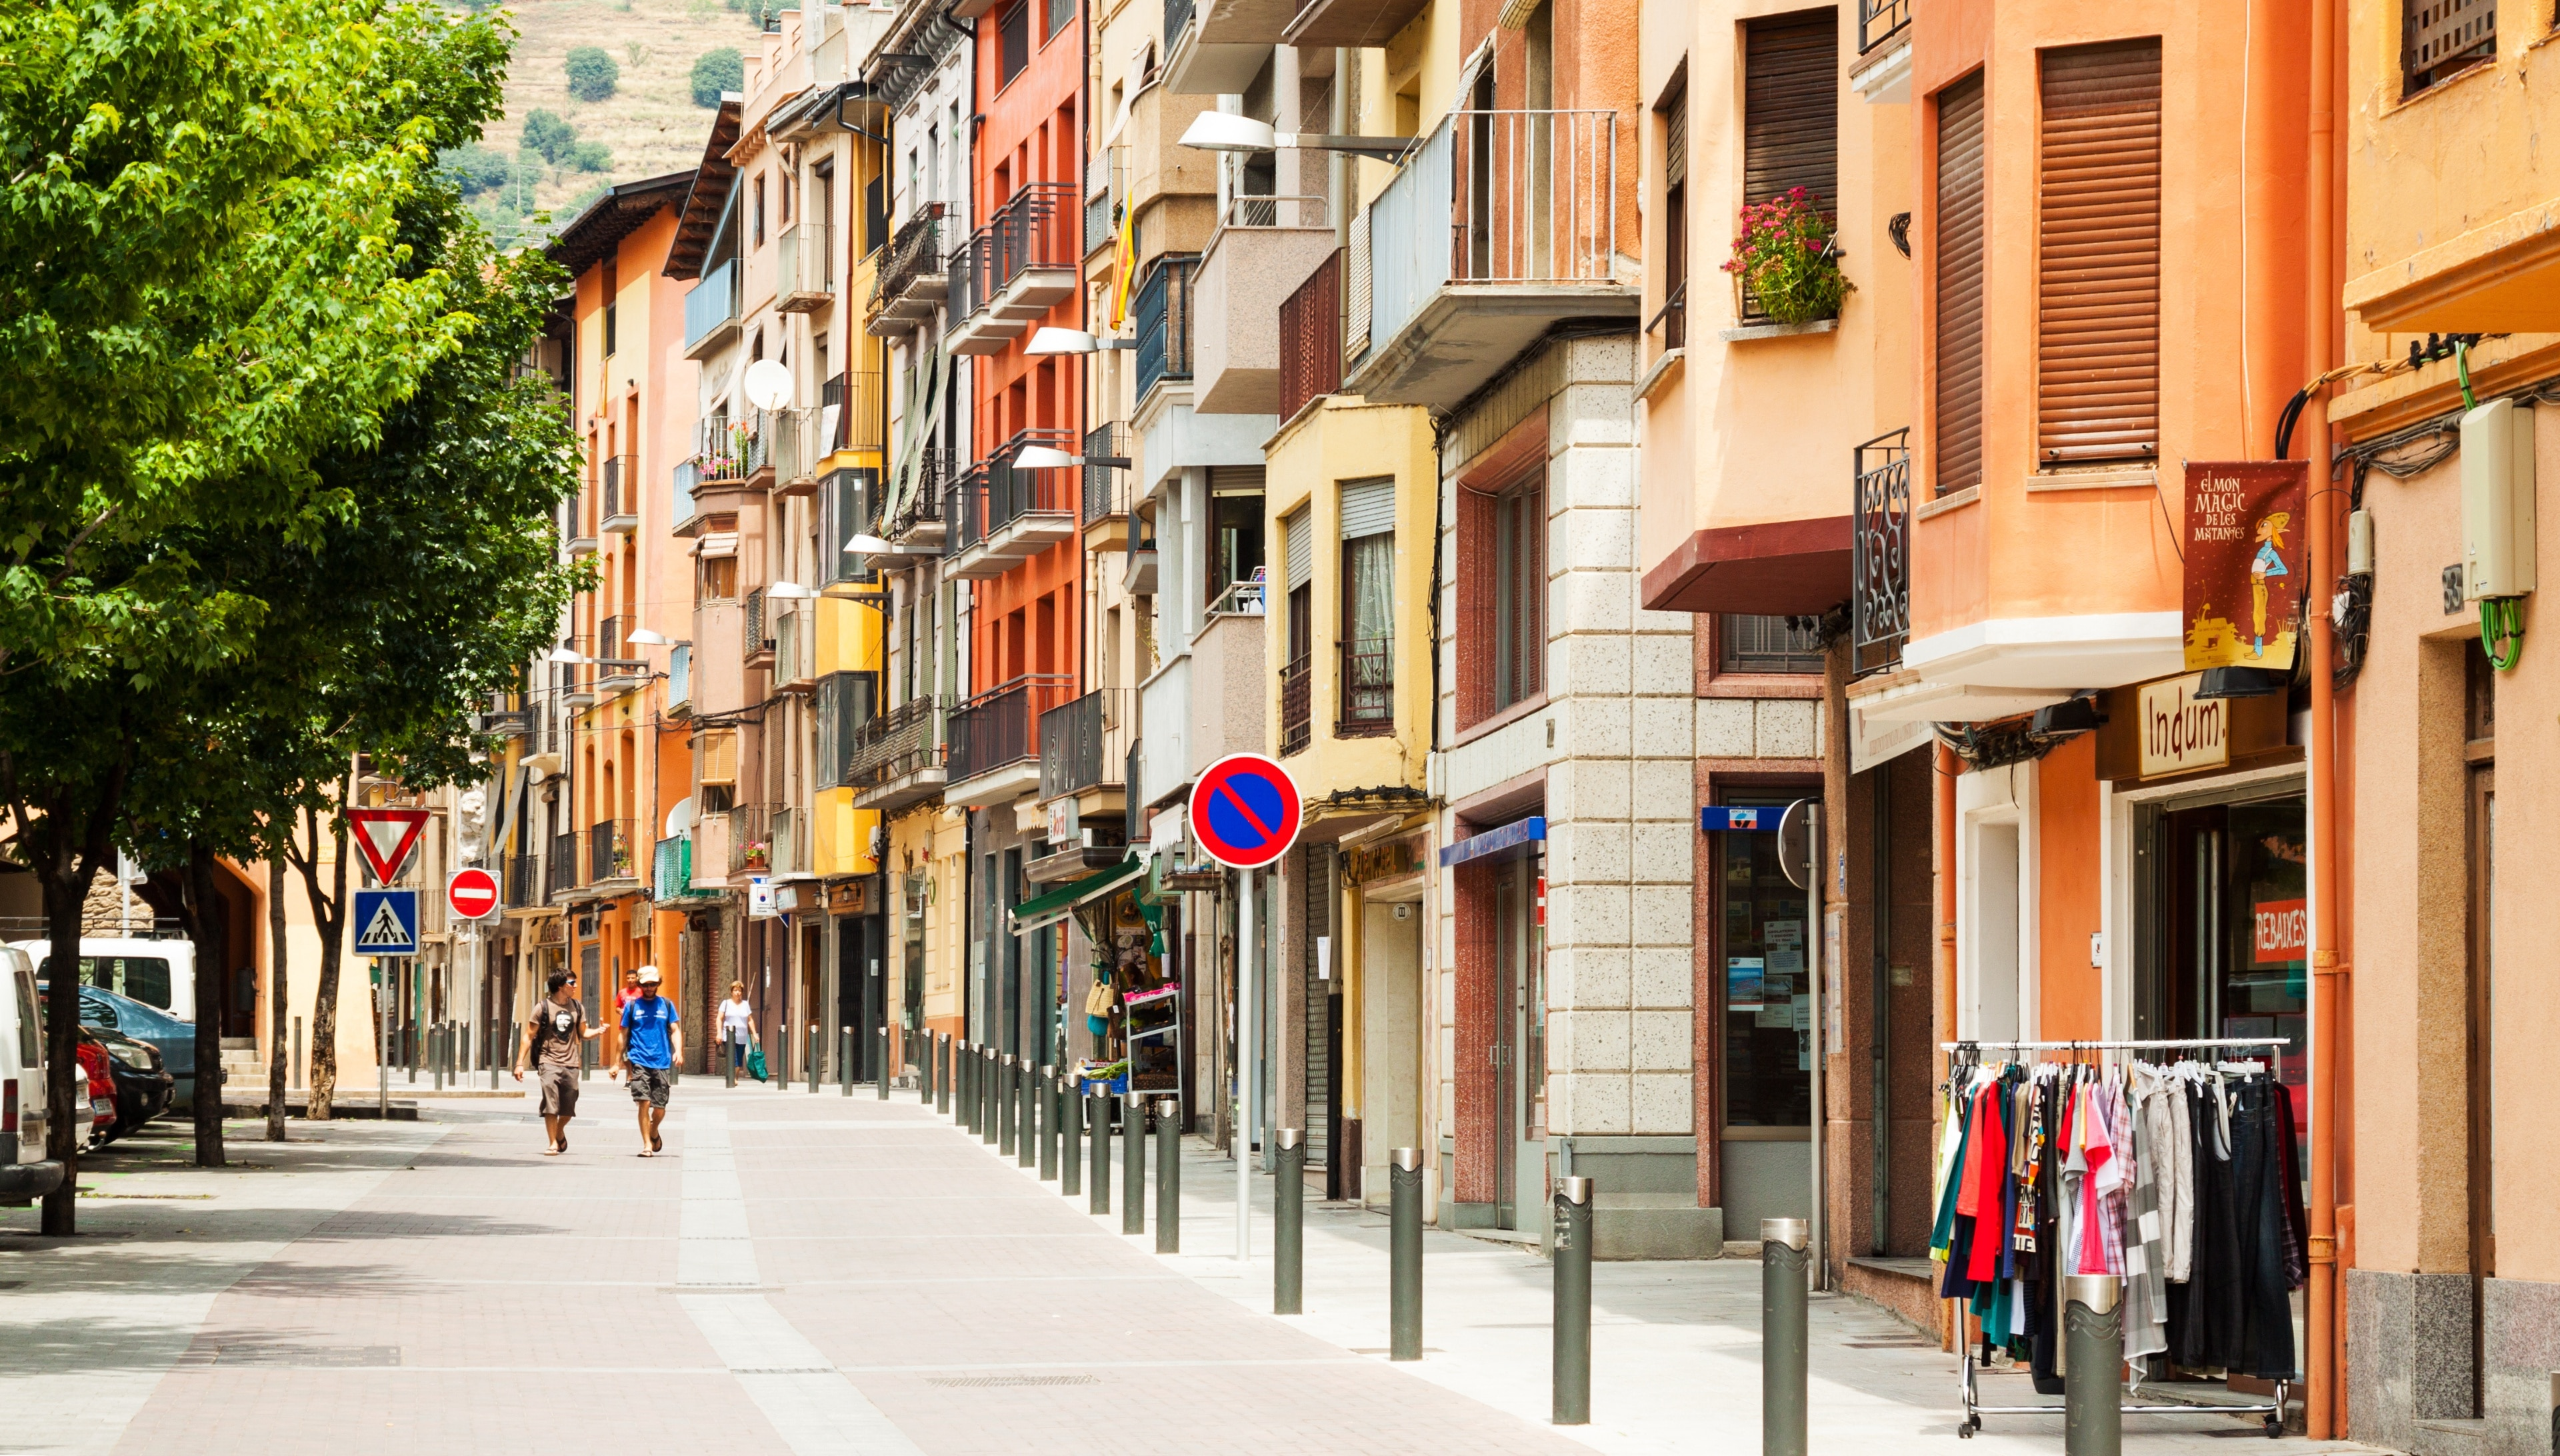 La Seu d'Urgell, Catalonia, Spain